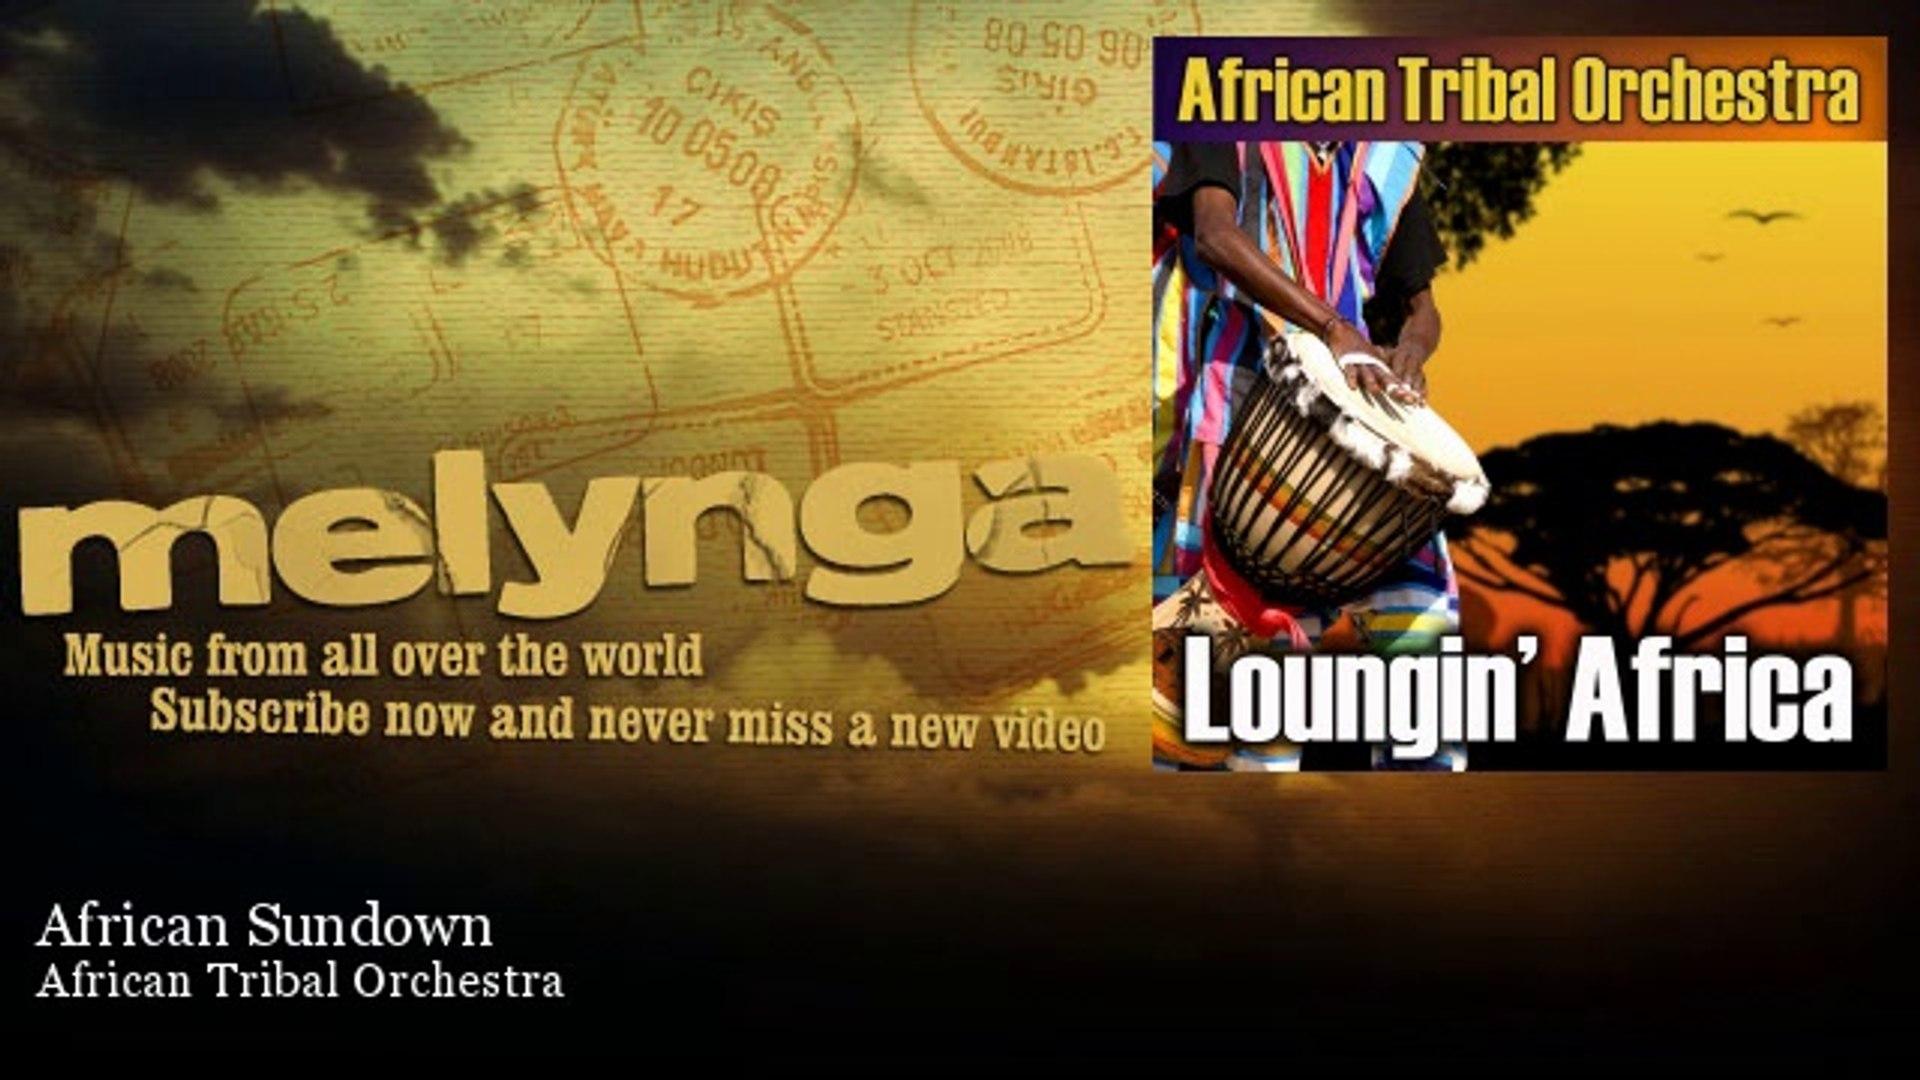 African Tribal Orchestra - African Sundown